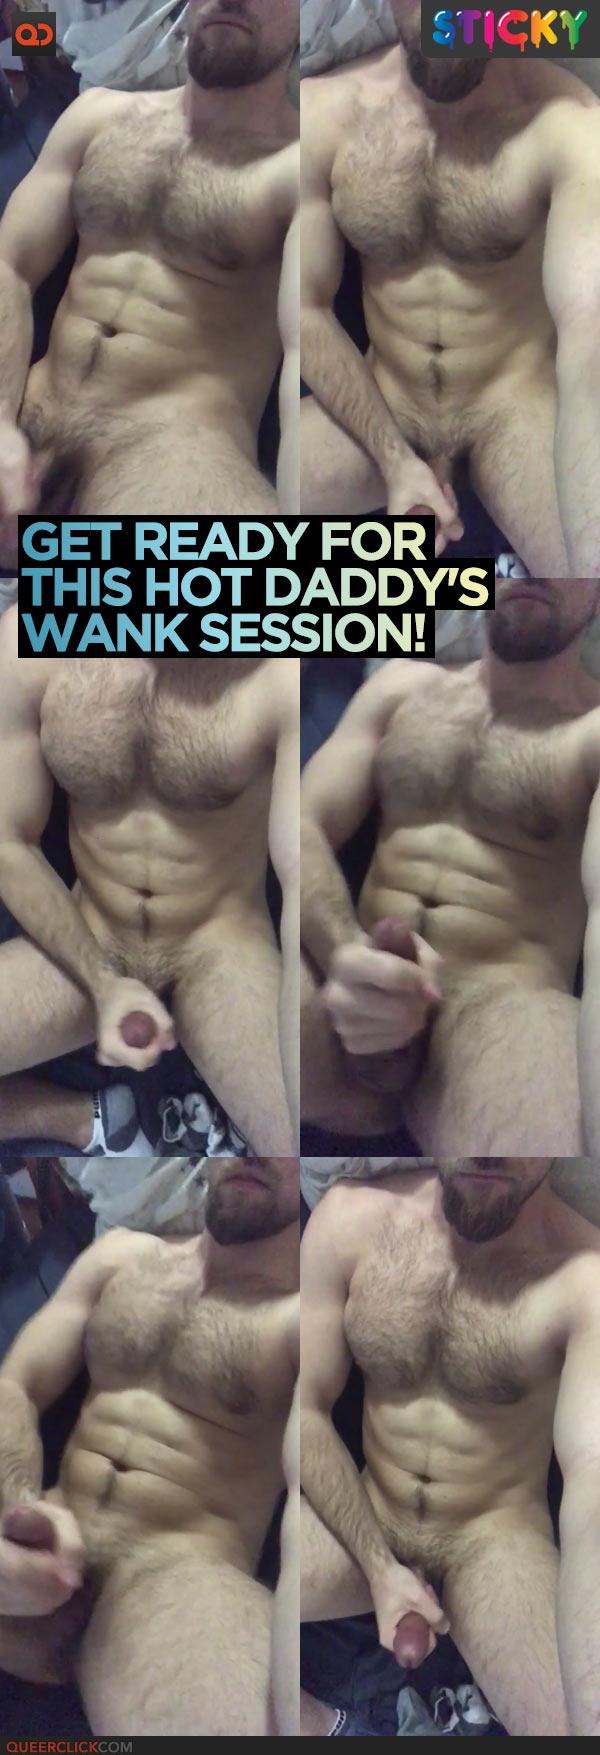 Wank Session